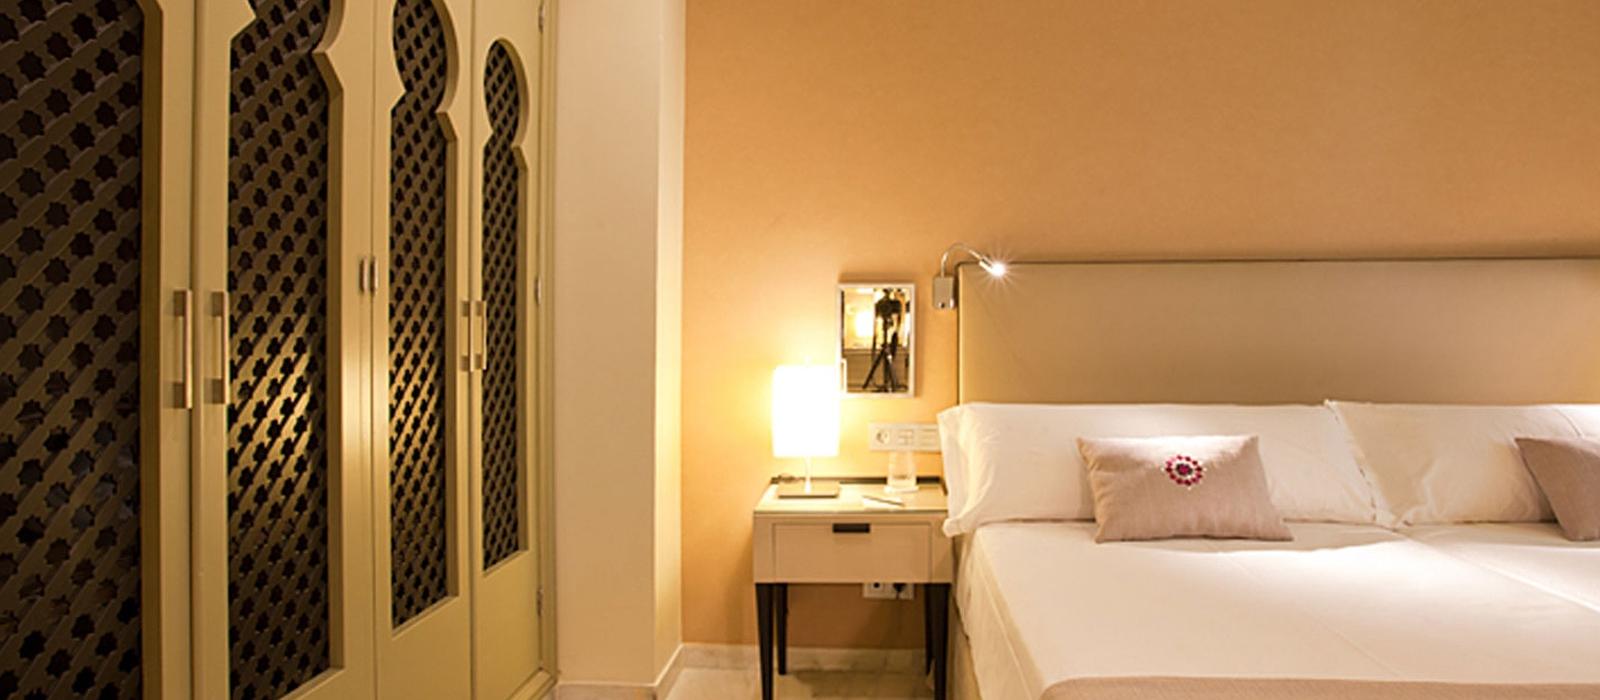 Chambre individuelle - Chambres Hôtel Grenade Albaicín - Vincci Hoteles